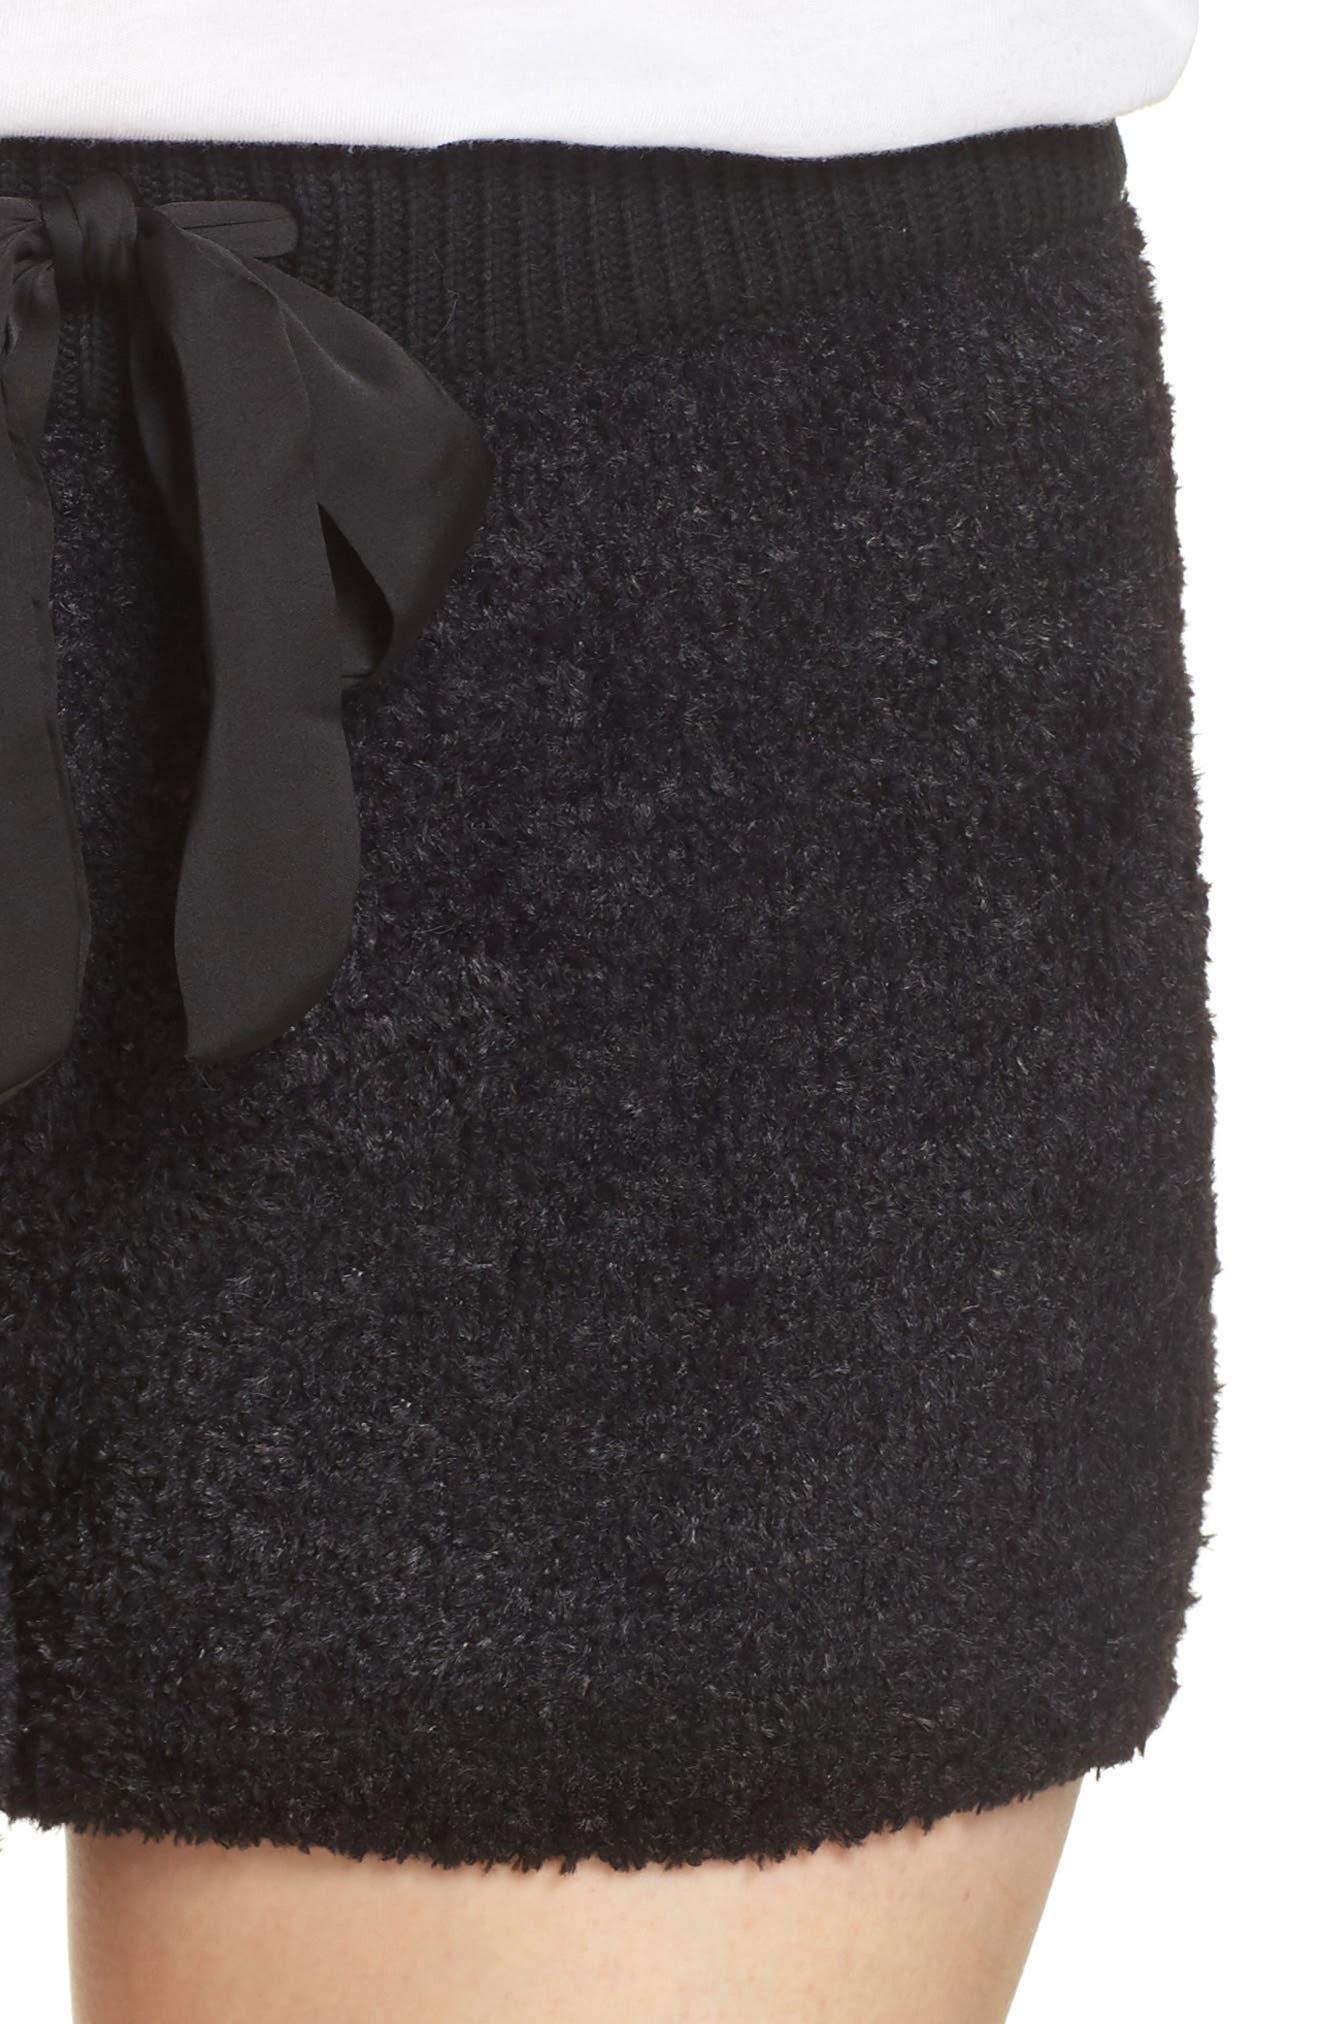 Fuzzy Lounge Shorts,                             Alternate thumbnail 4, color,                             BLACK